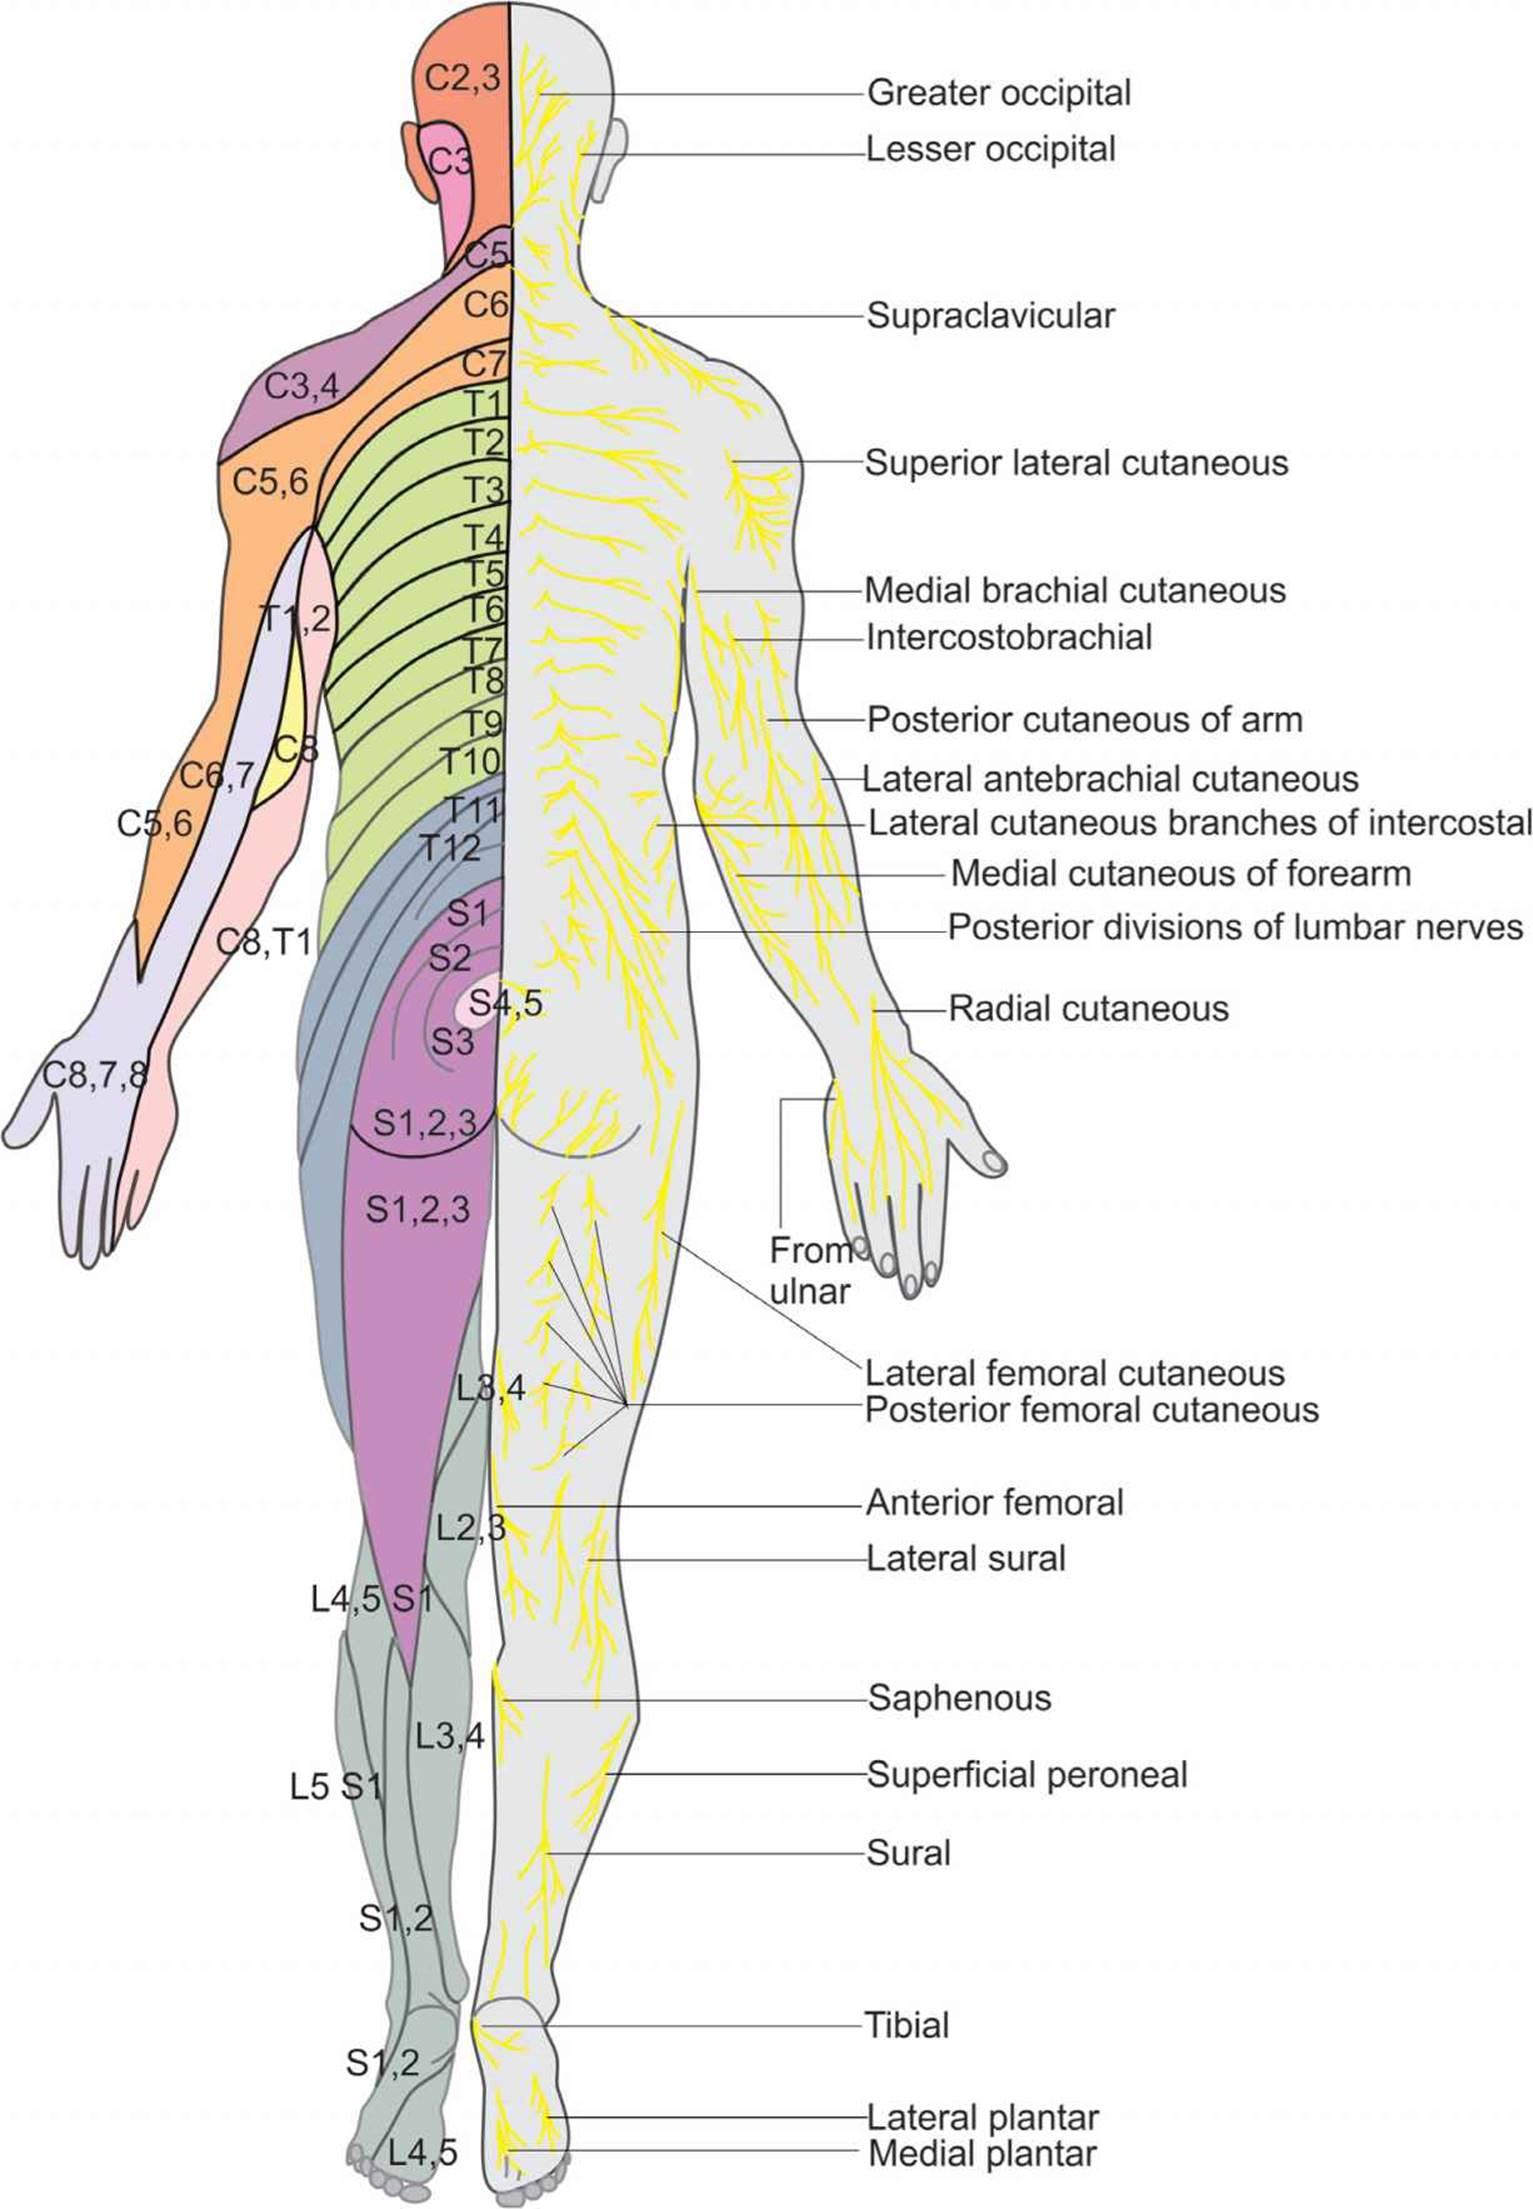 Essential Regional Anesthesia Anatomy - Hadzic\'s Peripheral Nerve ...